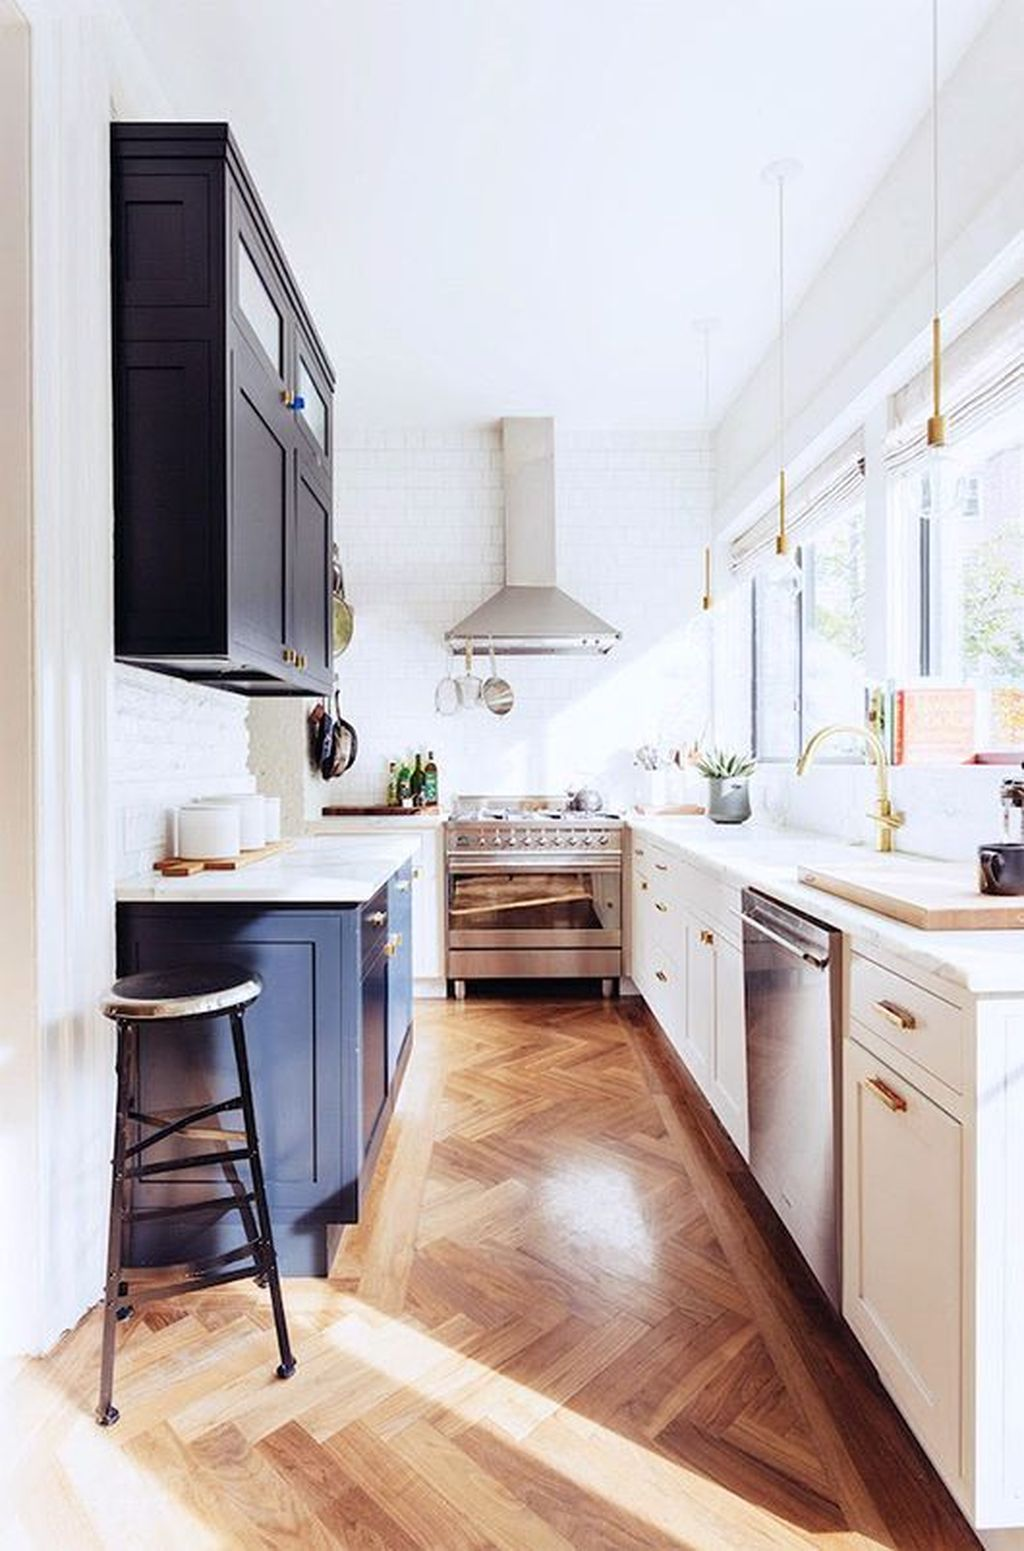 30 Popular U-Shaped Kitchen Design Ideas - PIMPHOMEE